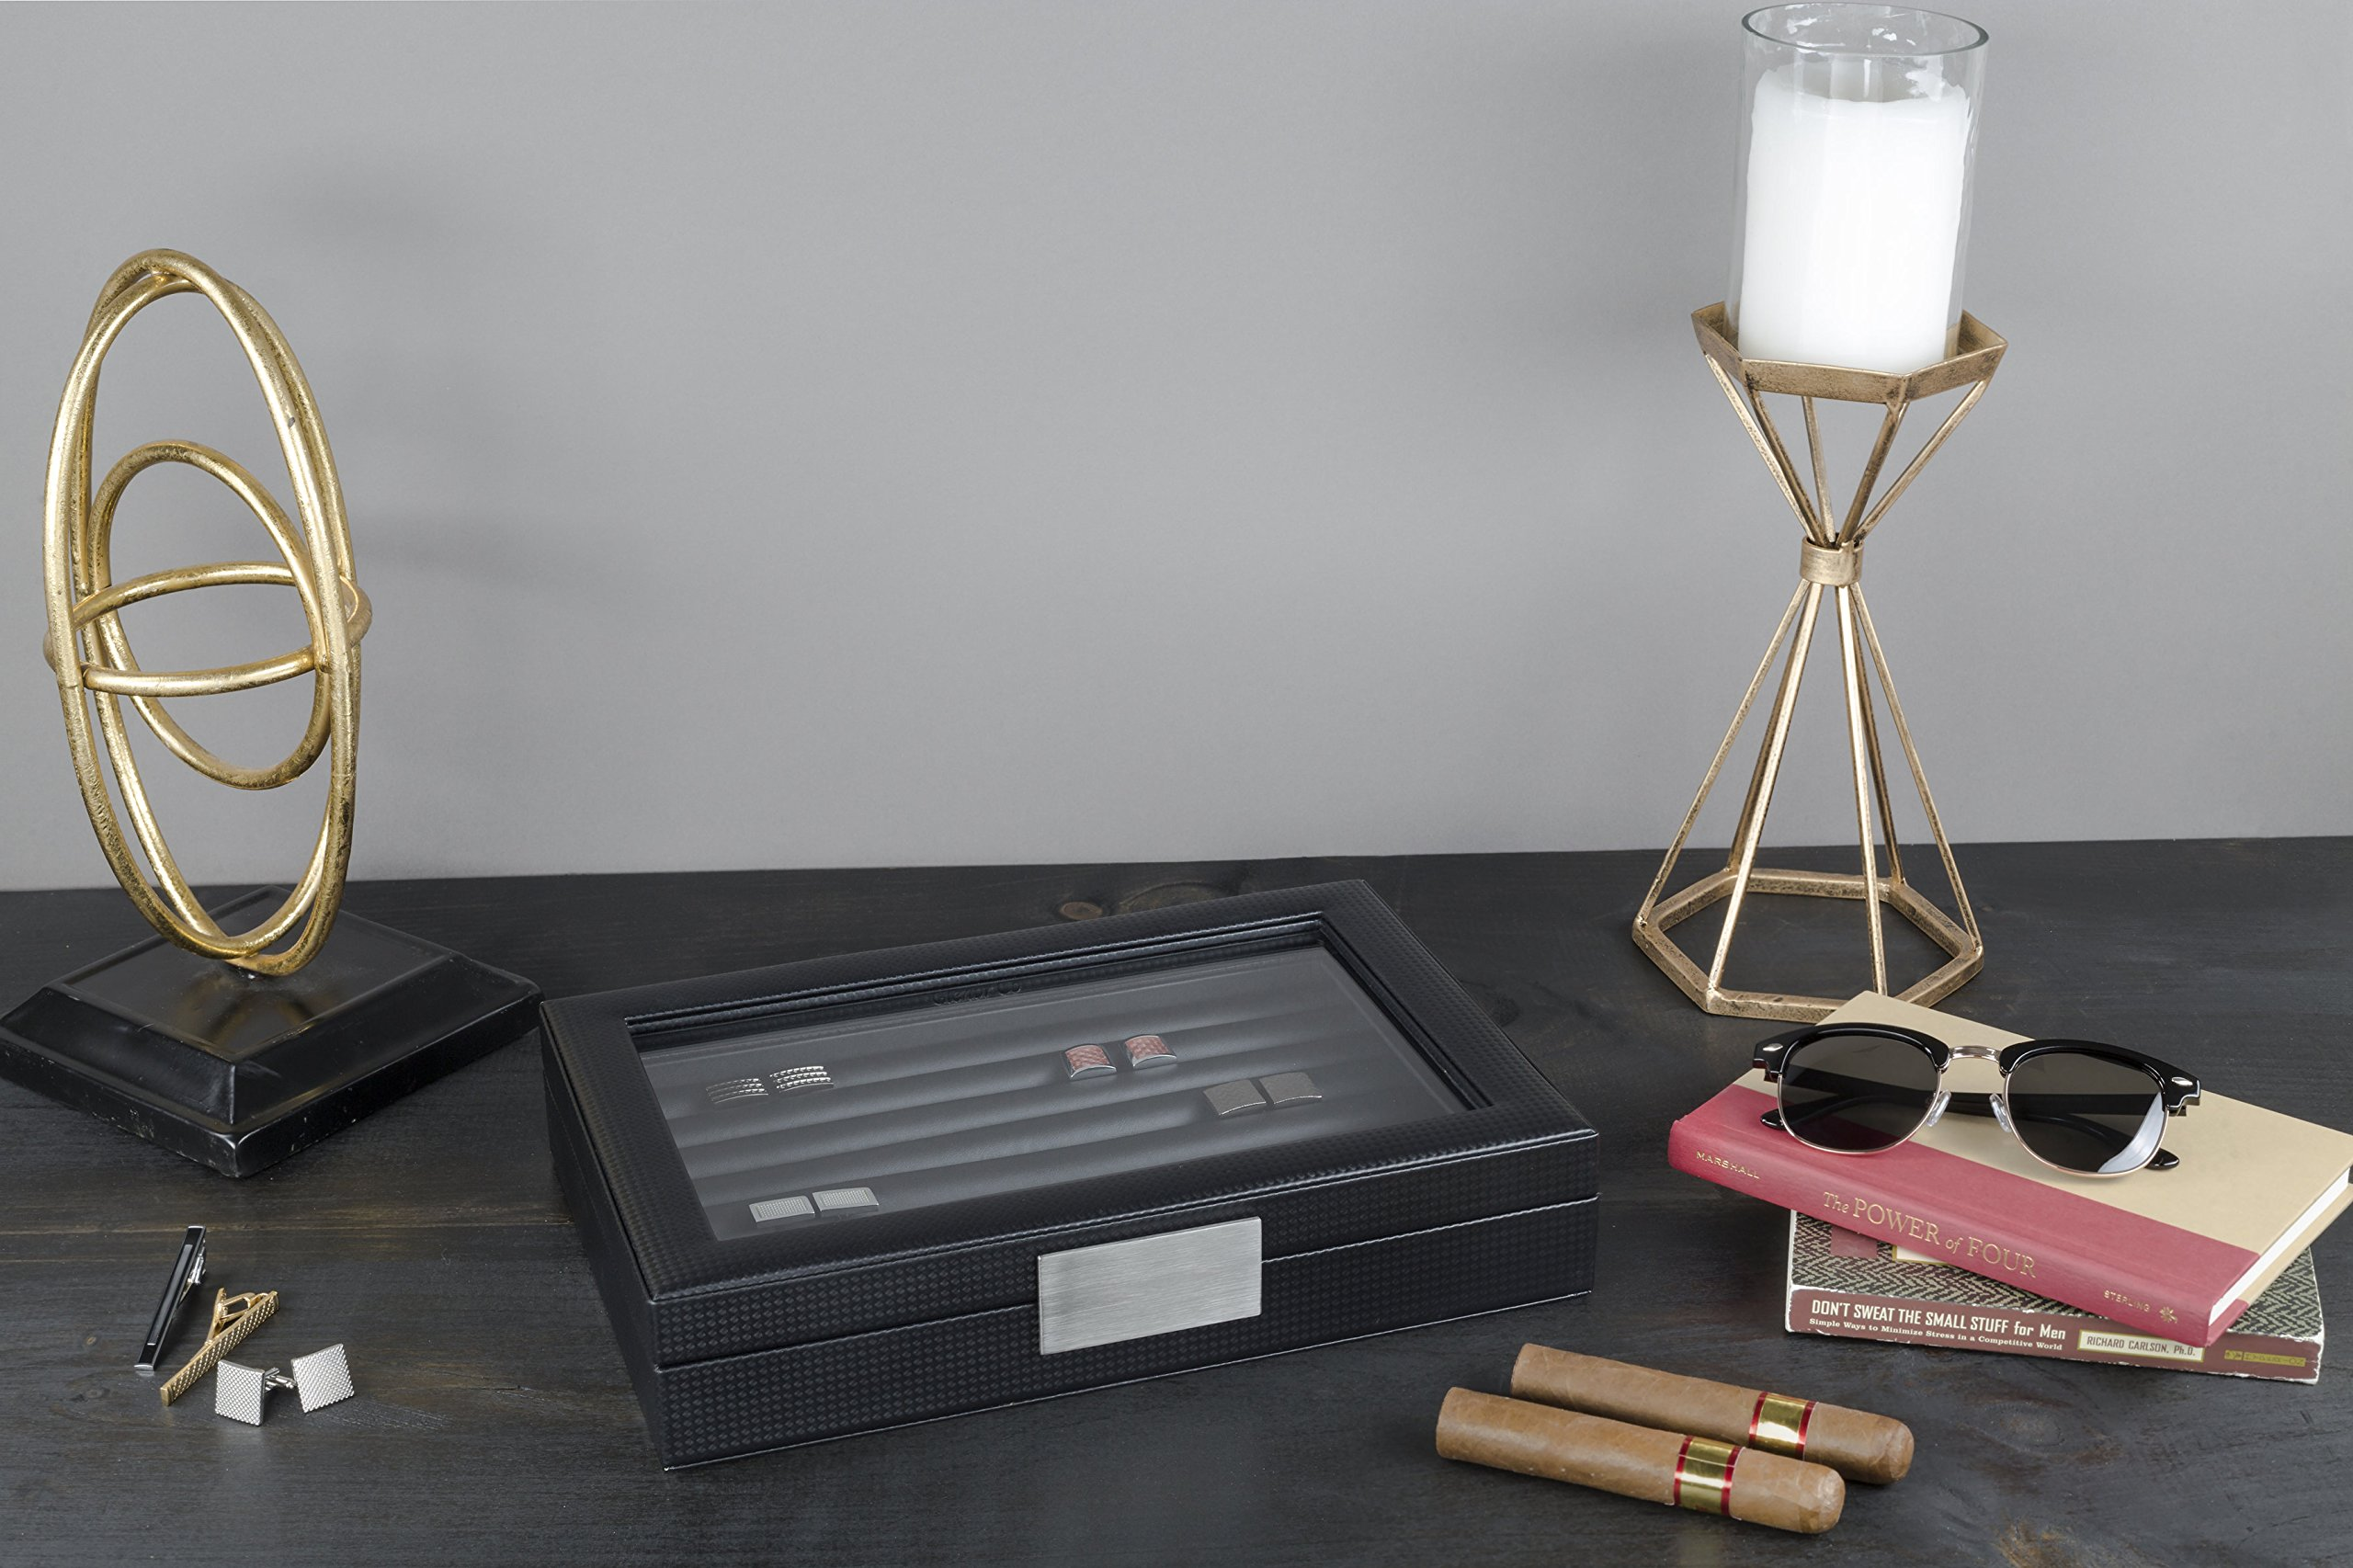 Glenor Co Cufflink Box for Men - Holds 70 Cufflinks - Luxury Display Jewelry Case -Carbon Fiber Design - Metal Buckle Holder, Large Glass Top - Black by Glenor Co (Image #5)